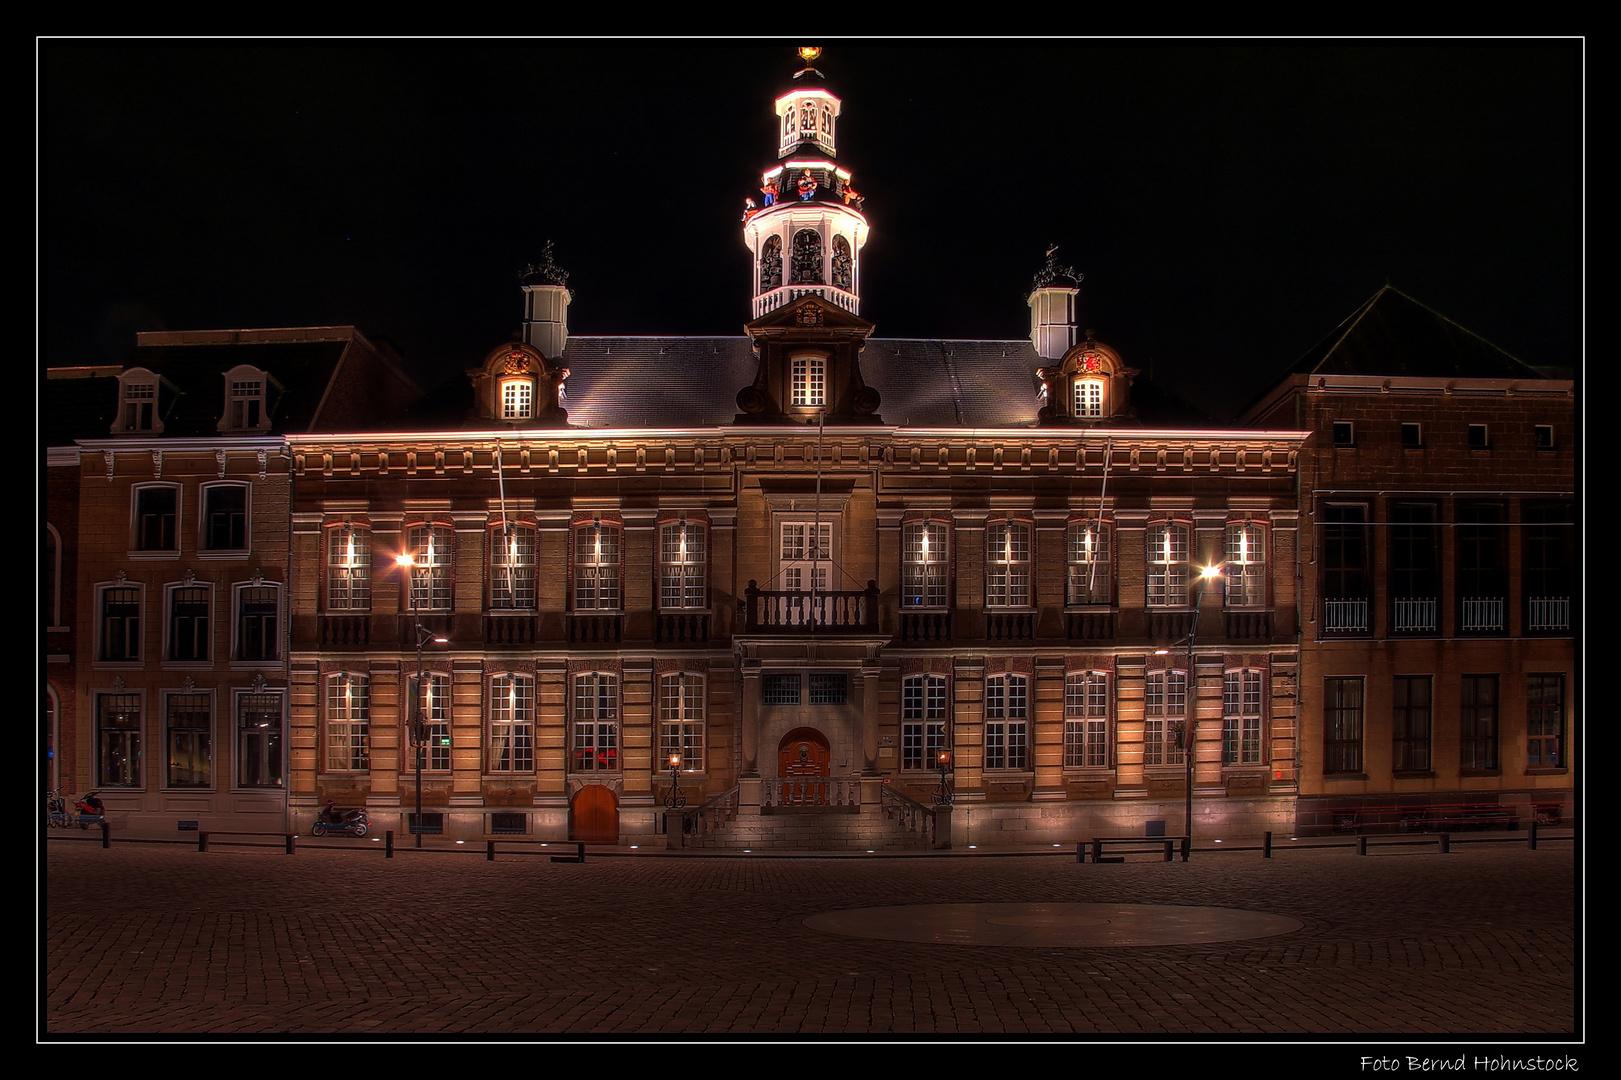 Roermond ... Rathaus